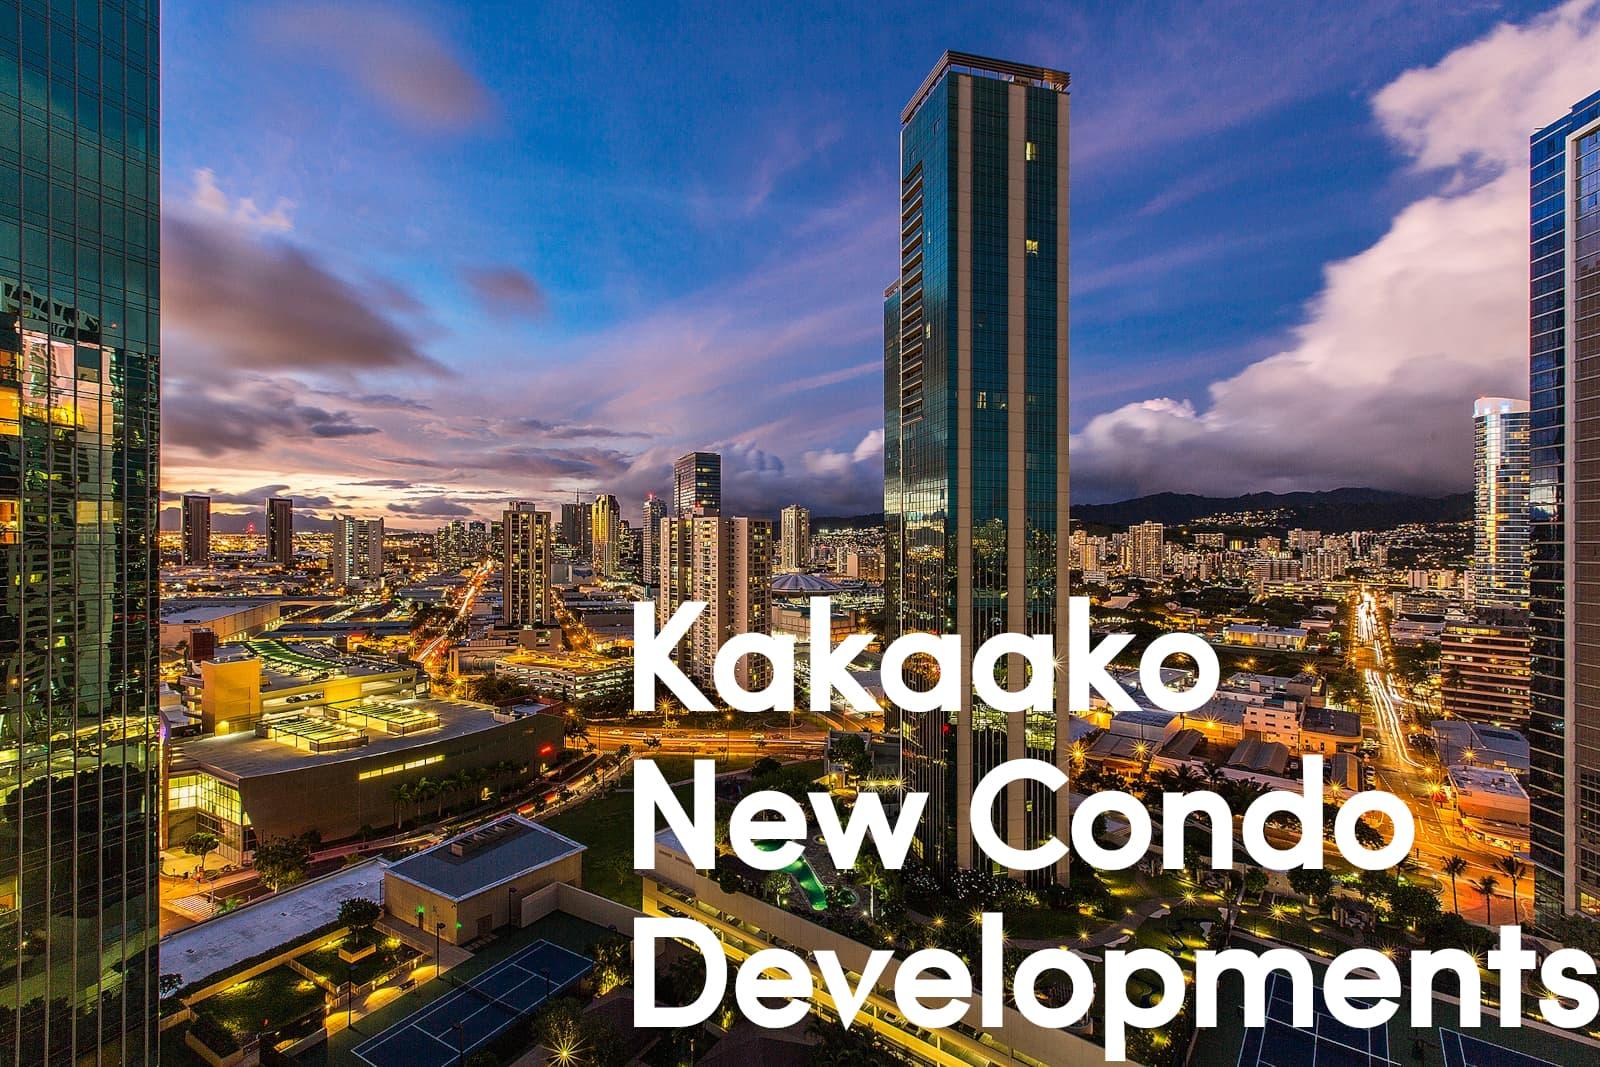 Kakaako New Condo Developments overlaid over a photo of Kakaako at night